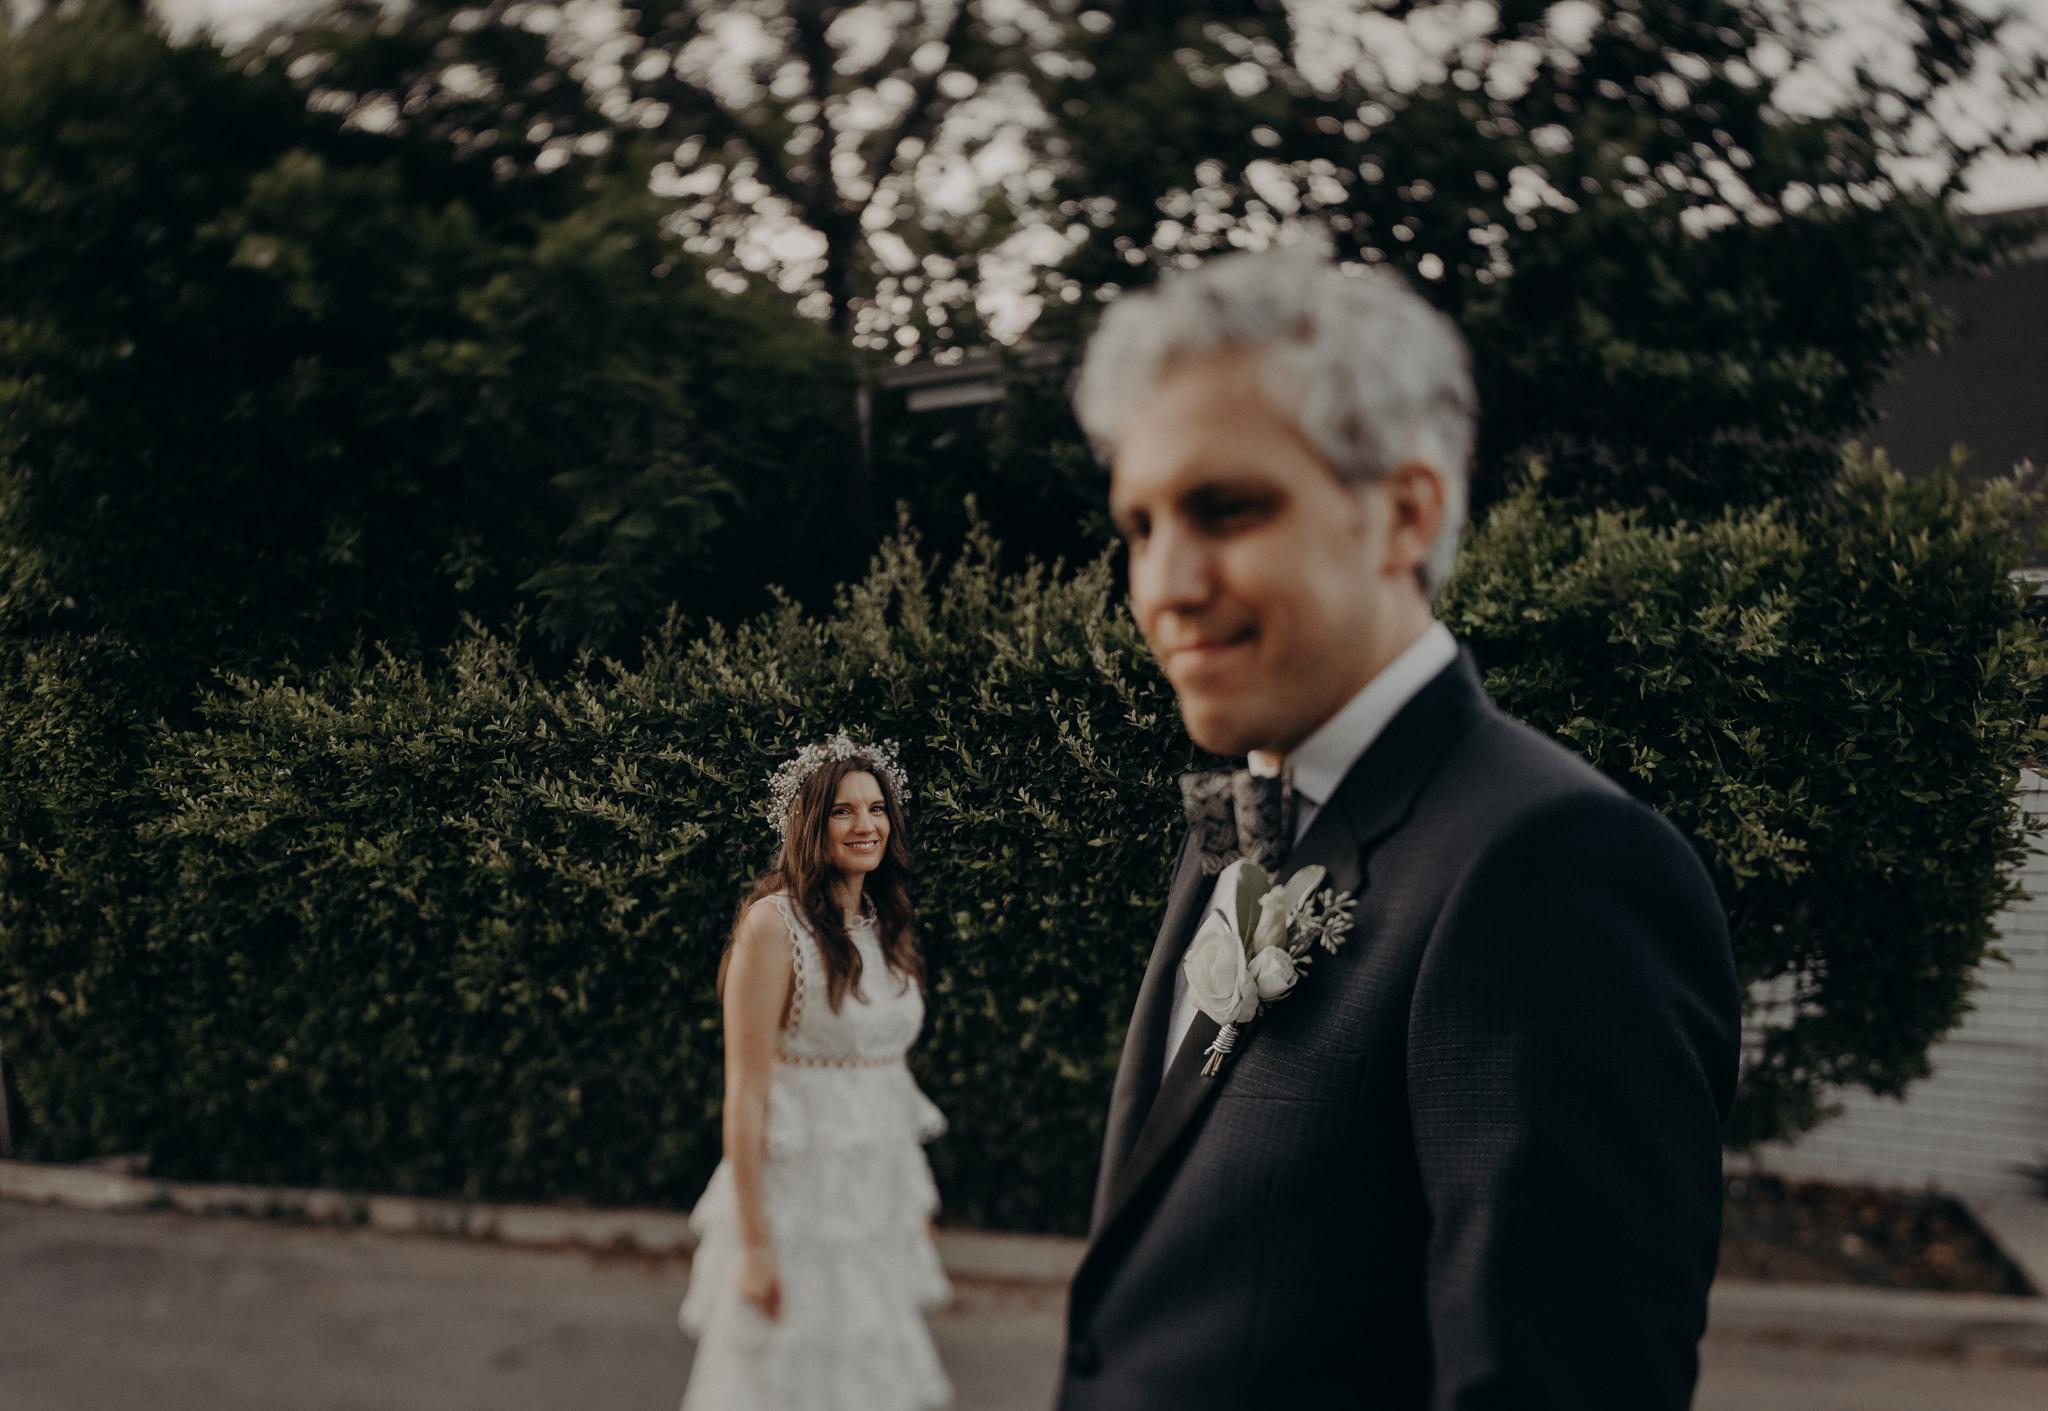 Isaiah + Taylor Photography - Private Estate Backyard Wedding - Beverly Hills - Los Angeles Wedding Photographer - 122.jpg